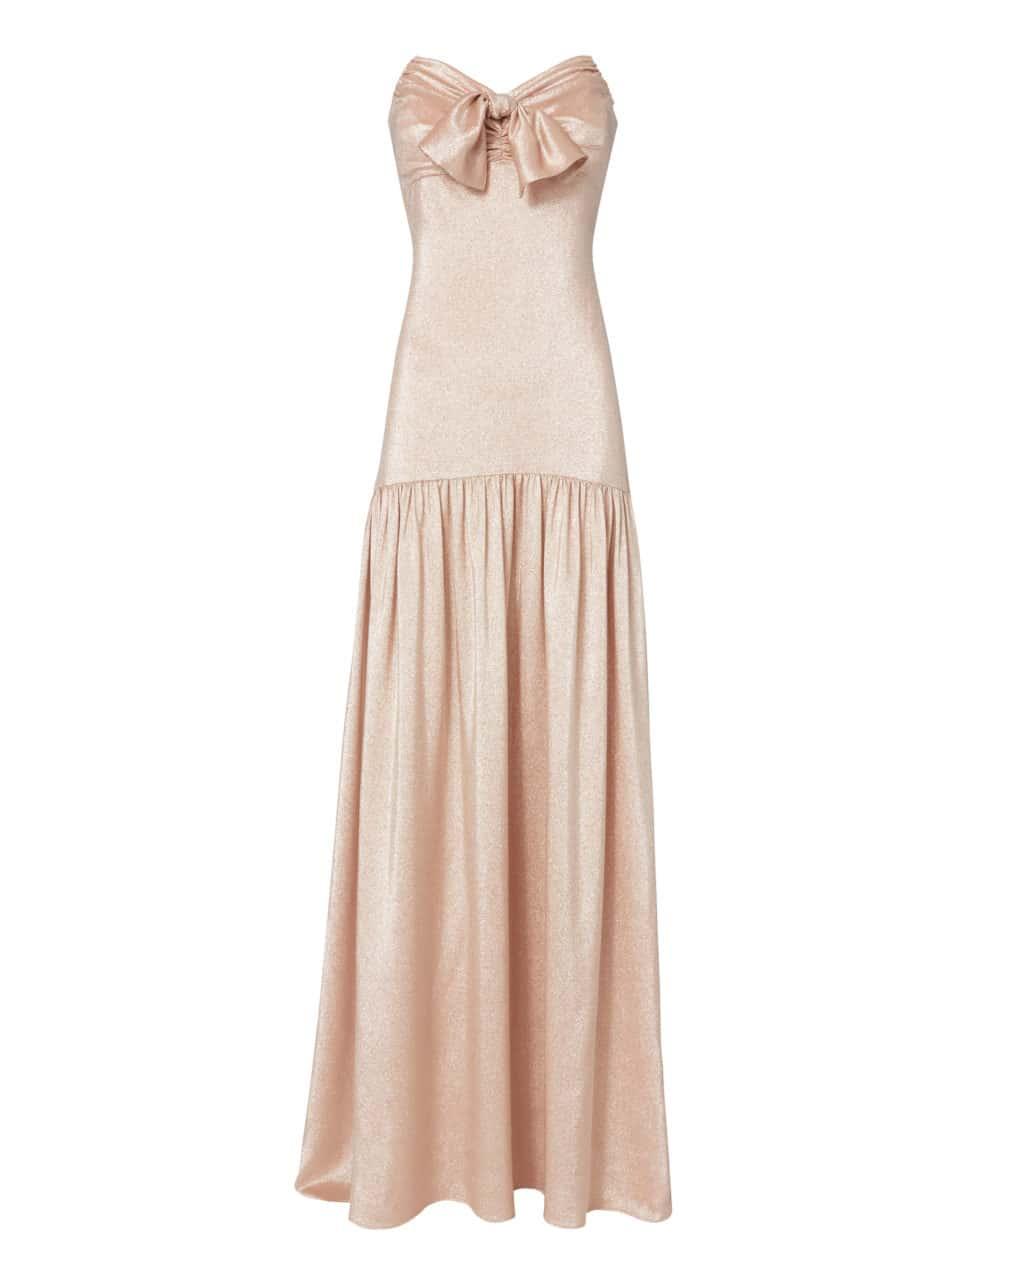 CAROLINE CONSTAS Strapless Bustier Metallic Dress - We Select Dresses